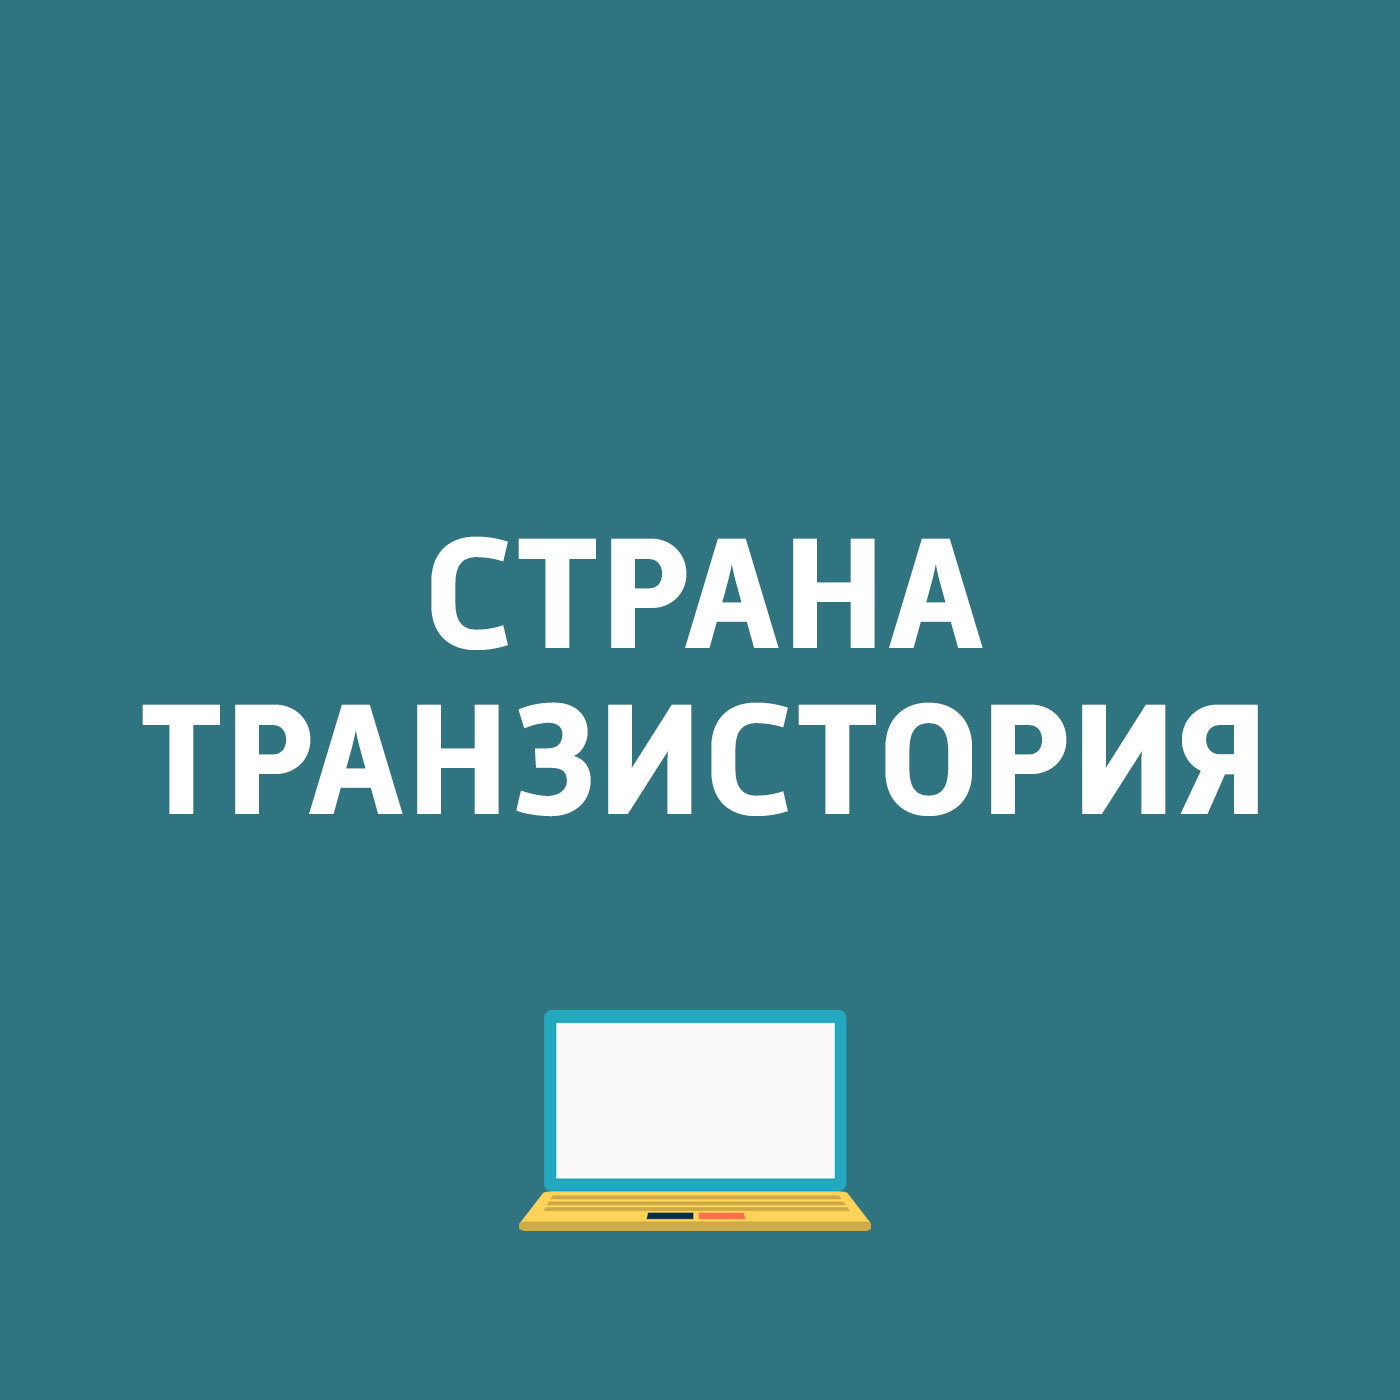 Картаев Павел Oukitel K6000 Premium получит 6 ГБ ОЗУ. LeEco Le 2 лишится 3,5-мм разъема.... lg g5 se h845 pink